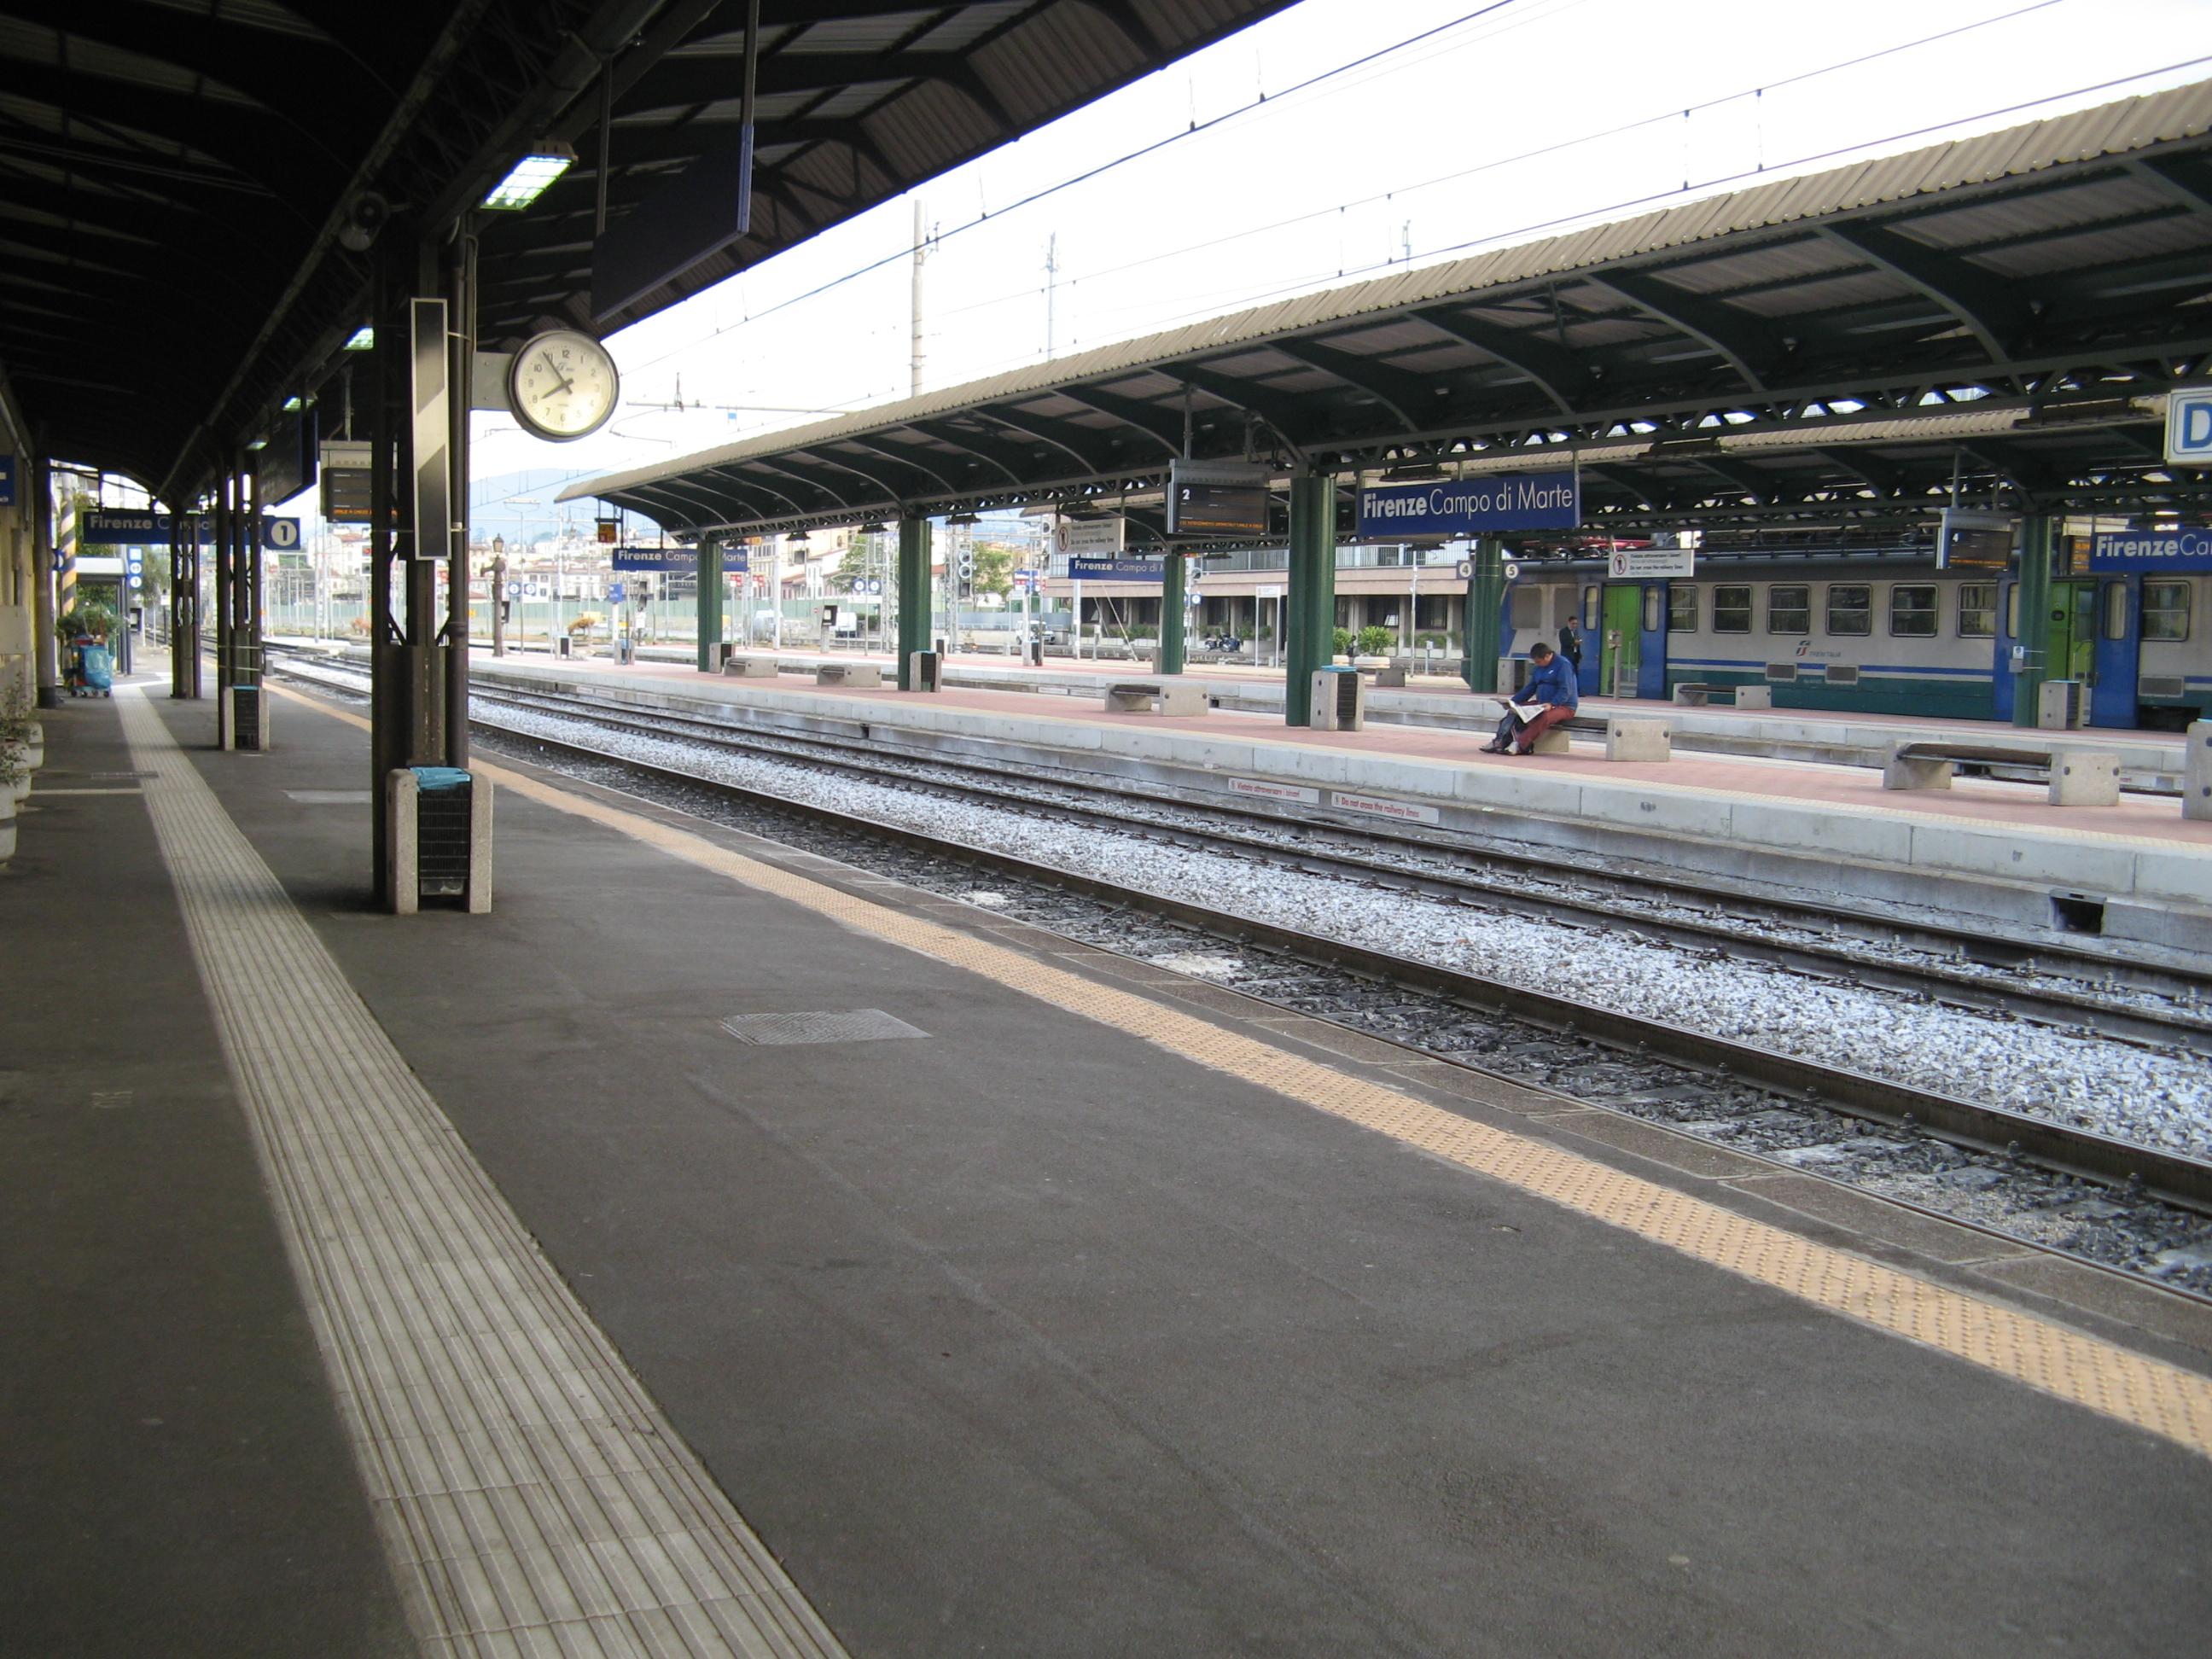 Moving Around Tuscany by TrainHow to Get Around Tuscany on Railways